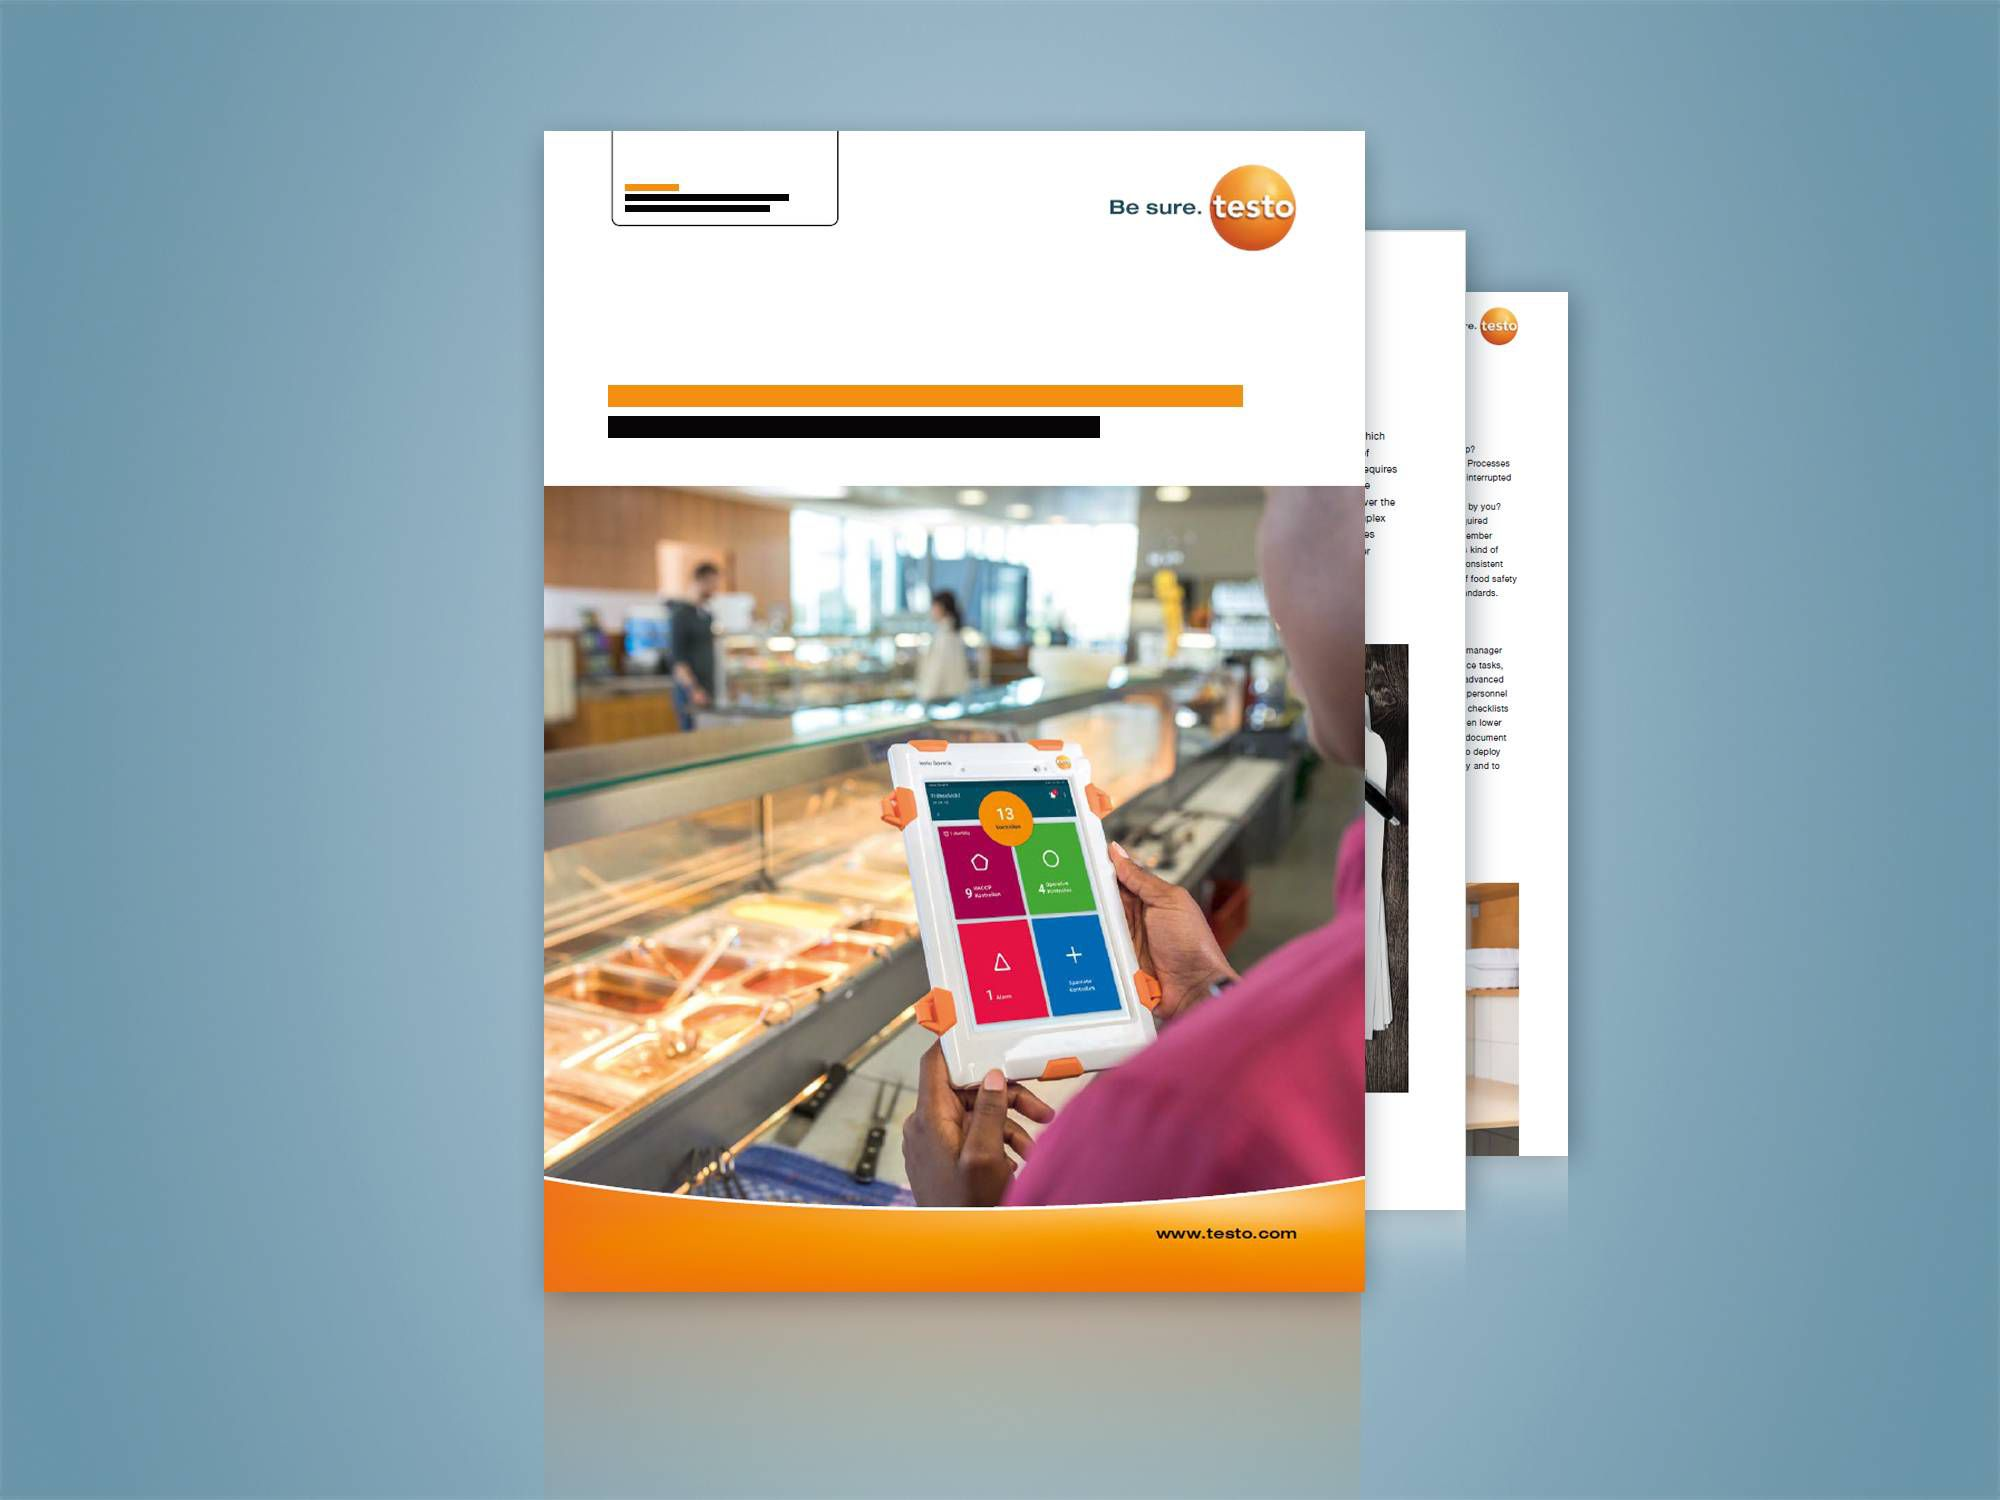 image-Whitepaper-Digital-Checklists-2000x1500.jpg